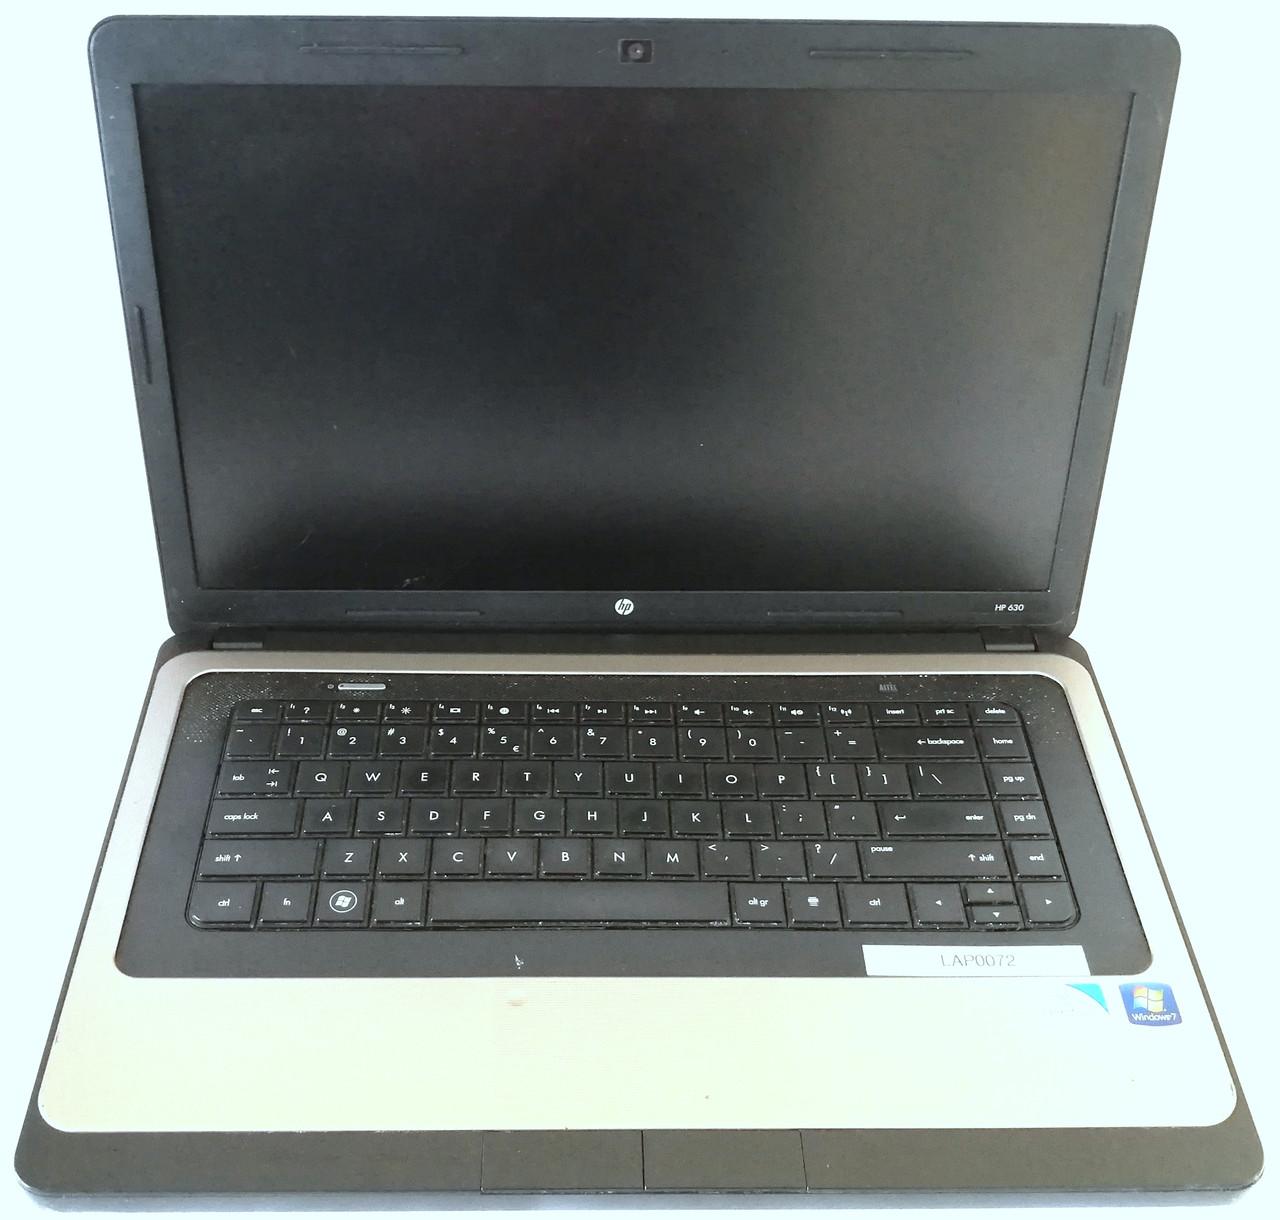 "Ноутбук HP 630 15.6"" 3 х USB 2.0, VGA, LAN (RJ-45), HDMI, Card Reader Б/У На запчасти"